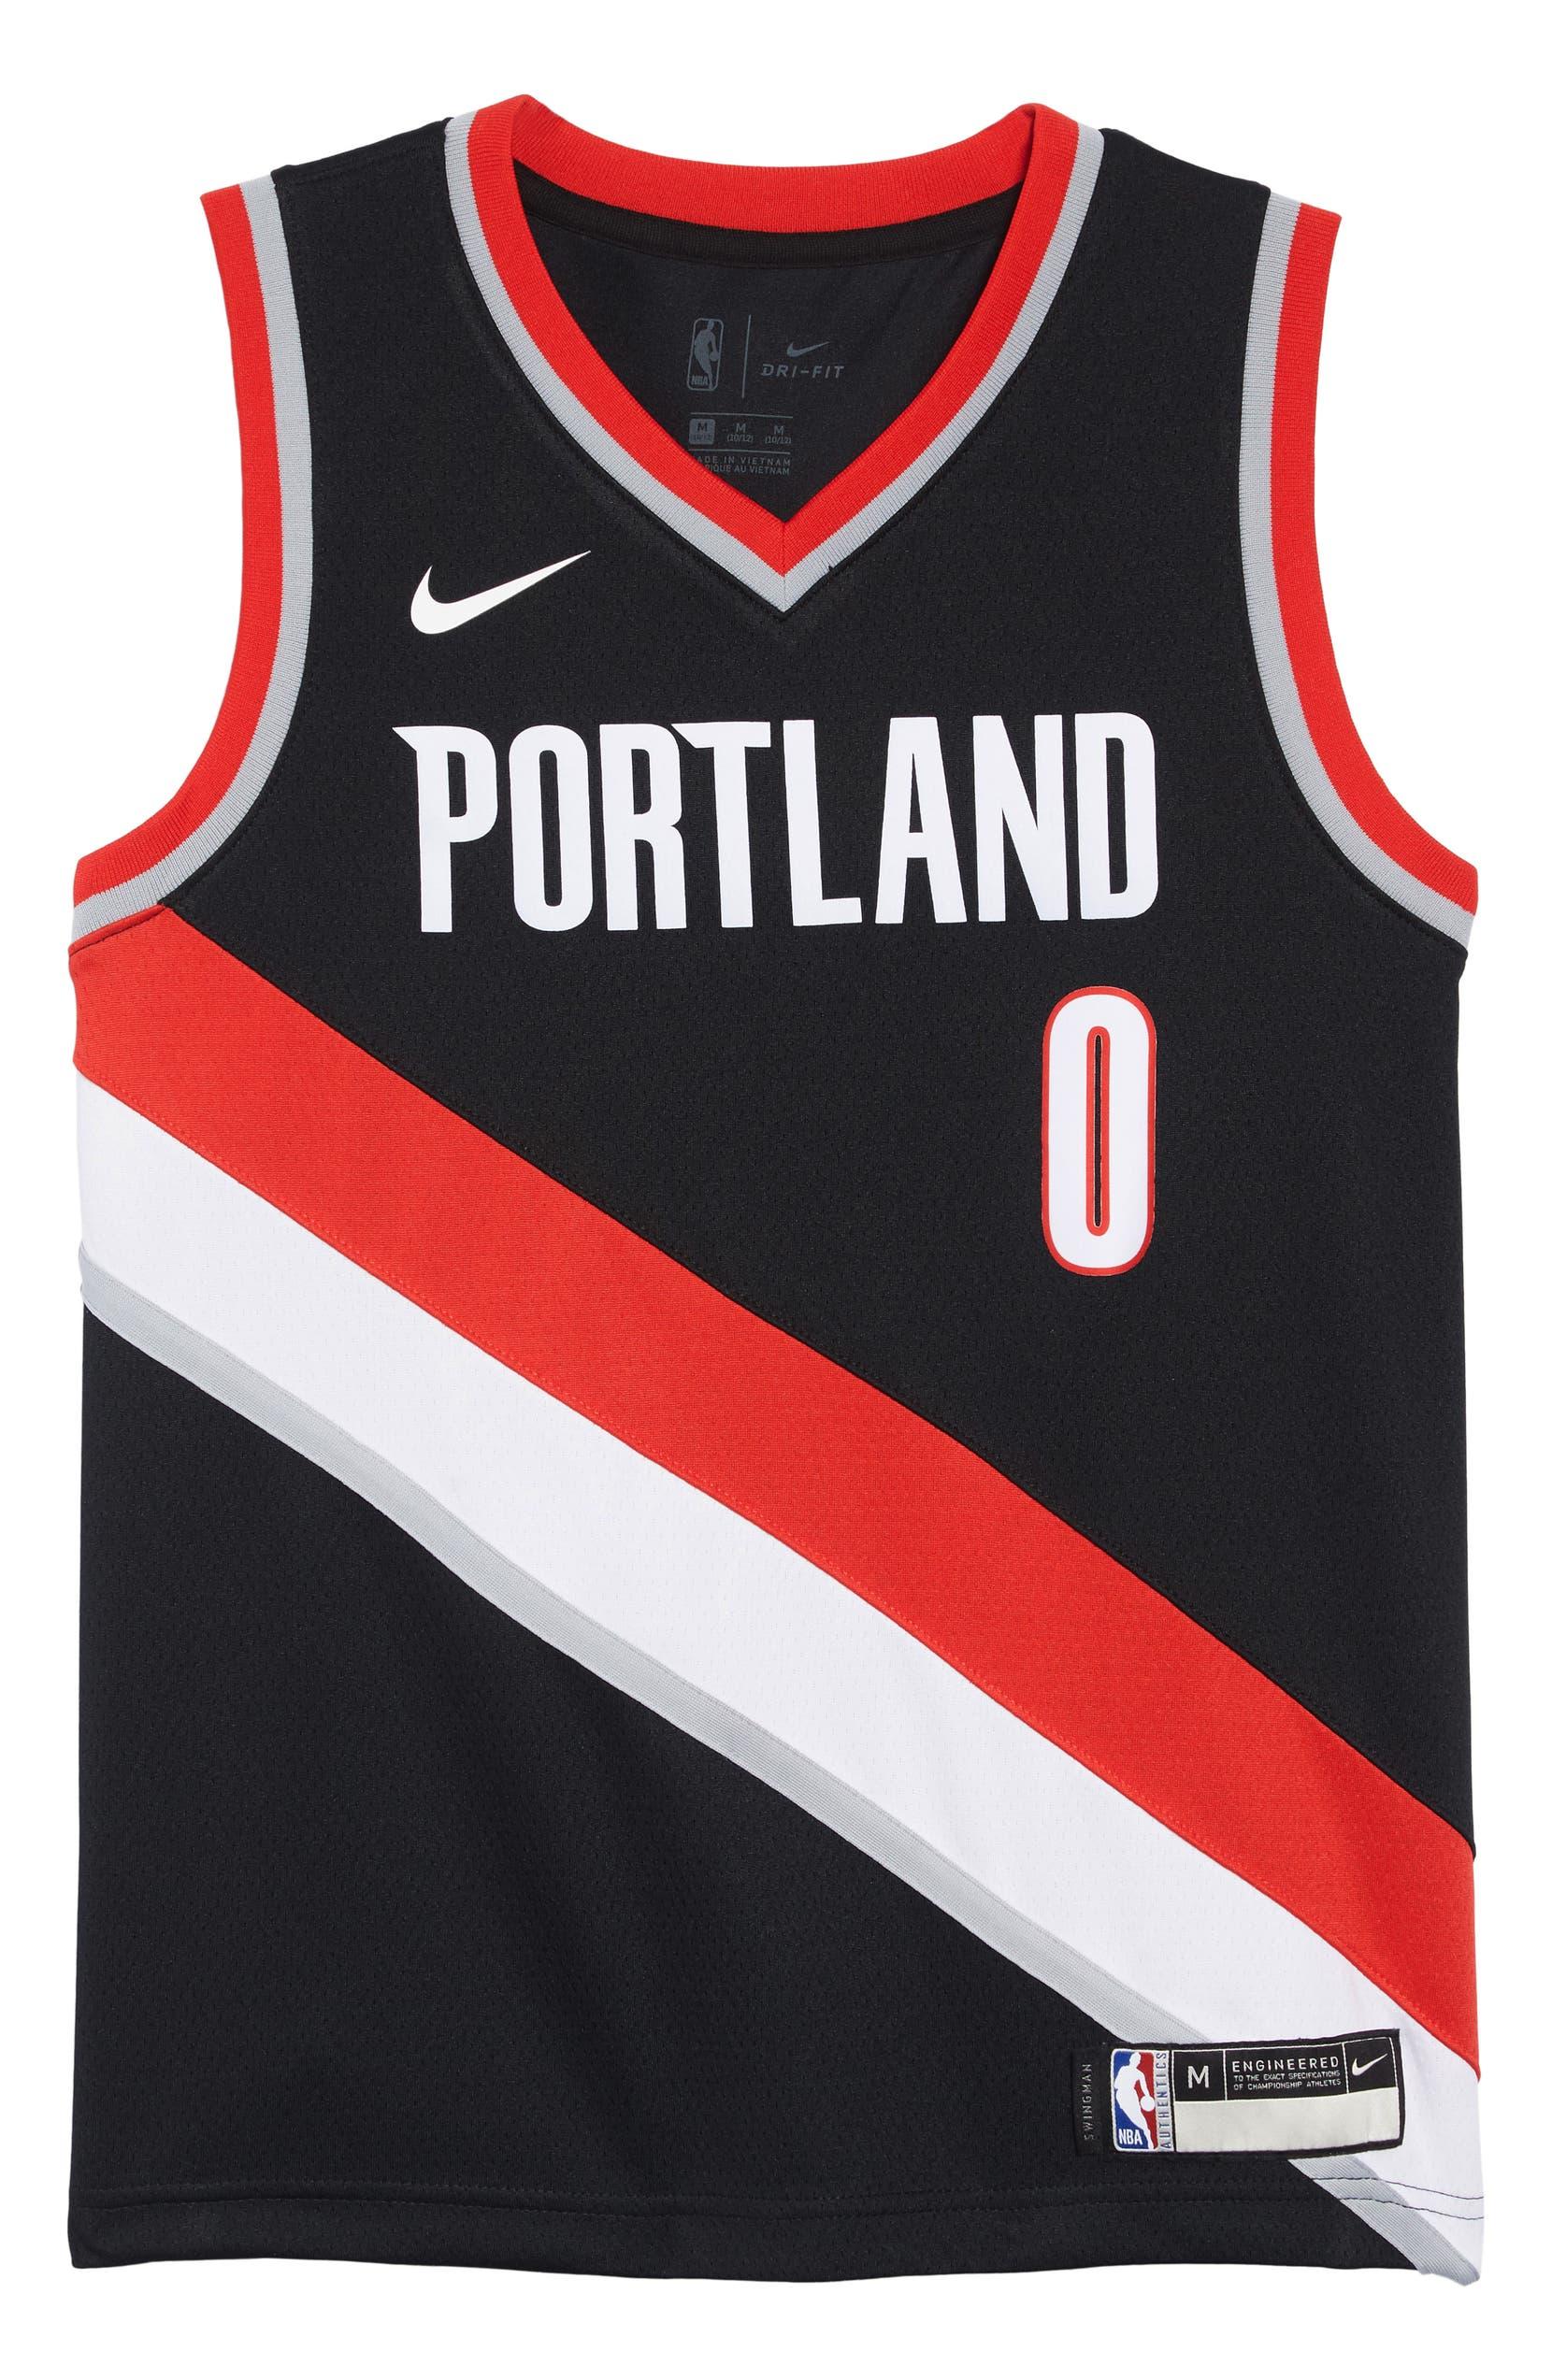 Nike Portland Trail Blazers Damian Lillard Basketball Jersey (Big Boys)  c8fc1bfeb32